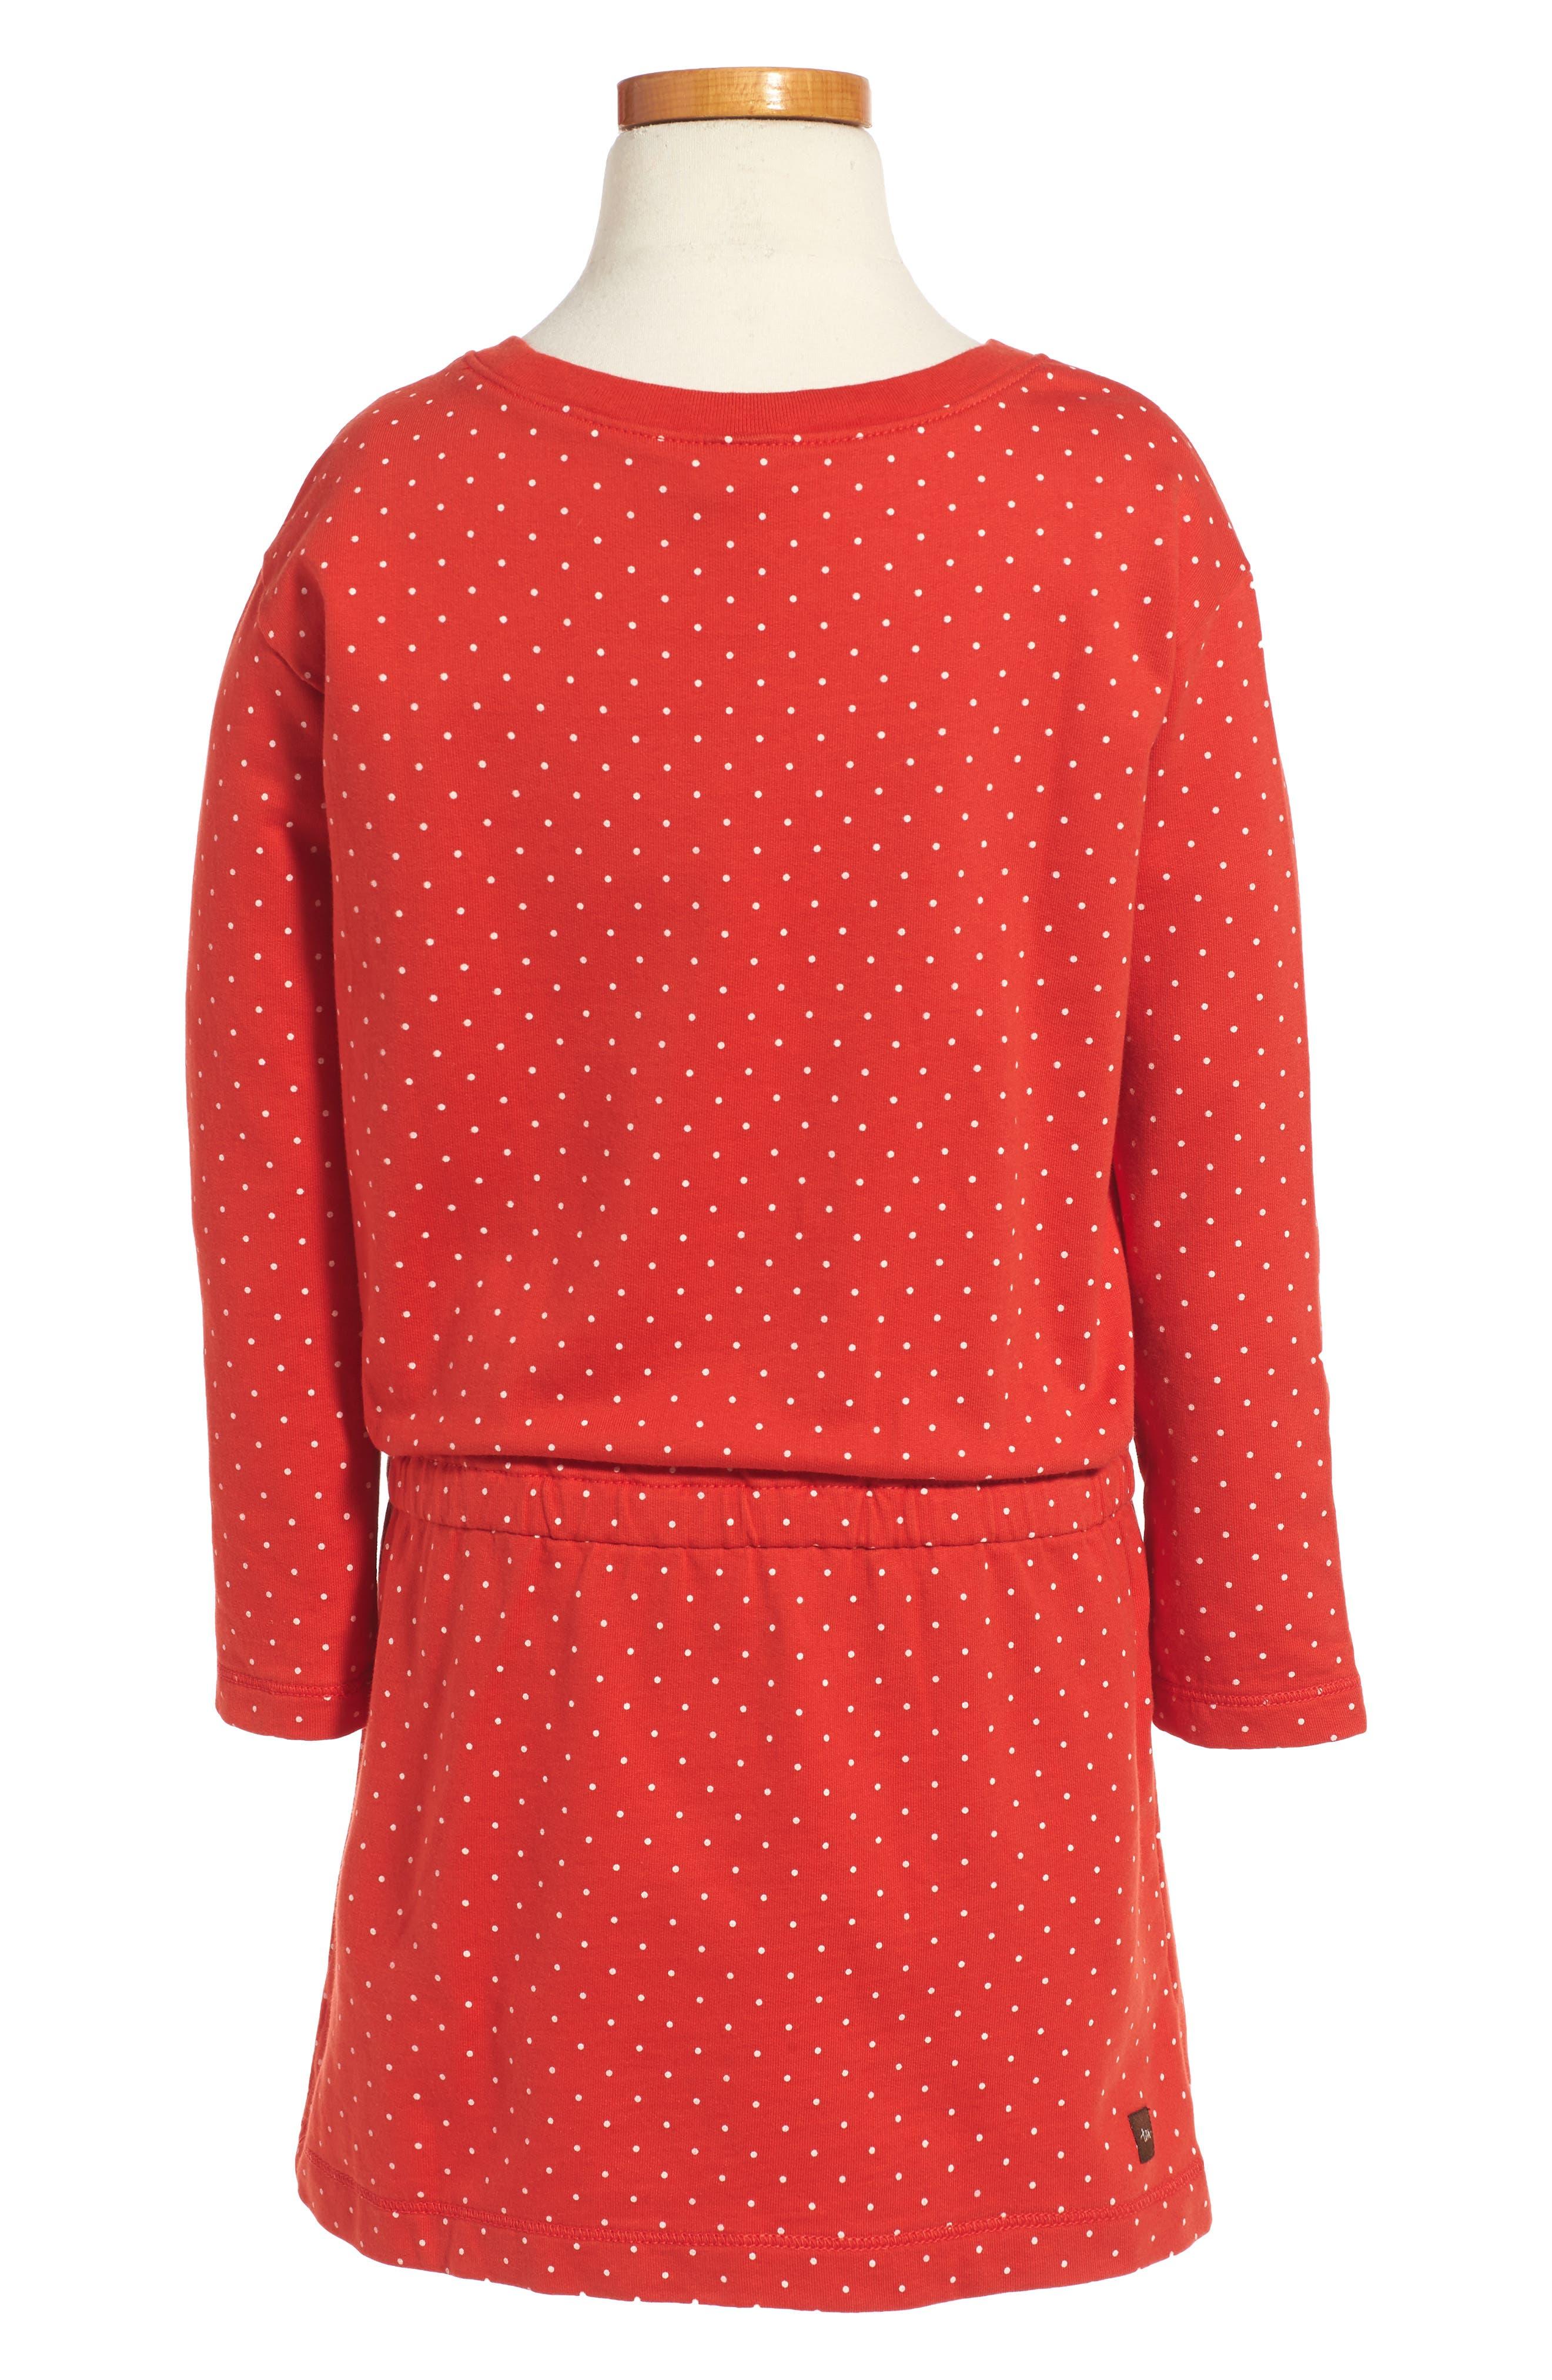 Dotty Dress,                             Alternate thumbnail 2, color,                             629